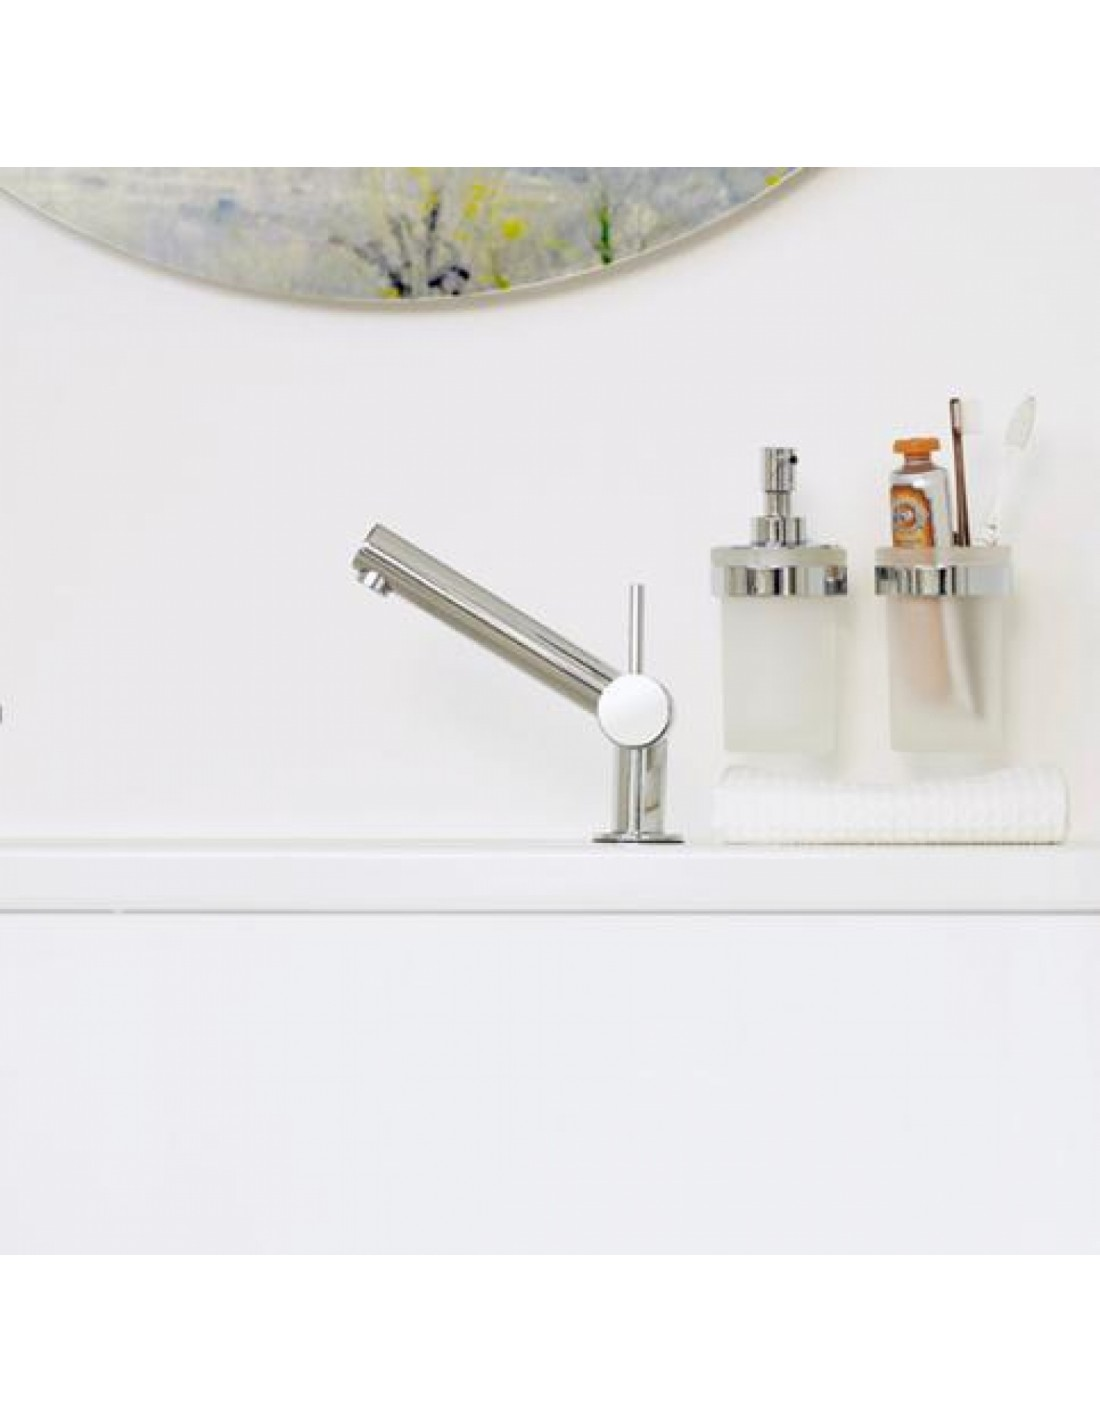 distributeur de savon liquide mural verre coller duo round. Black Bedroom Furniture Sets. Home Design Ideas